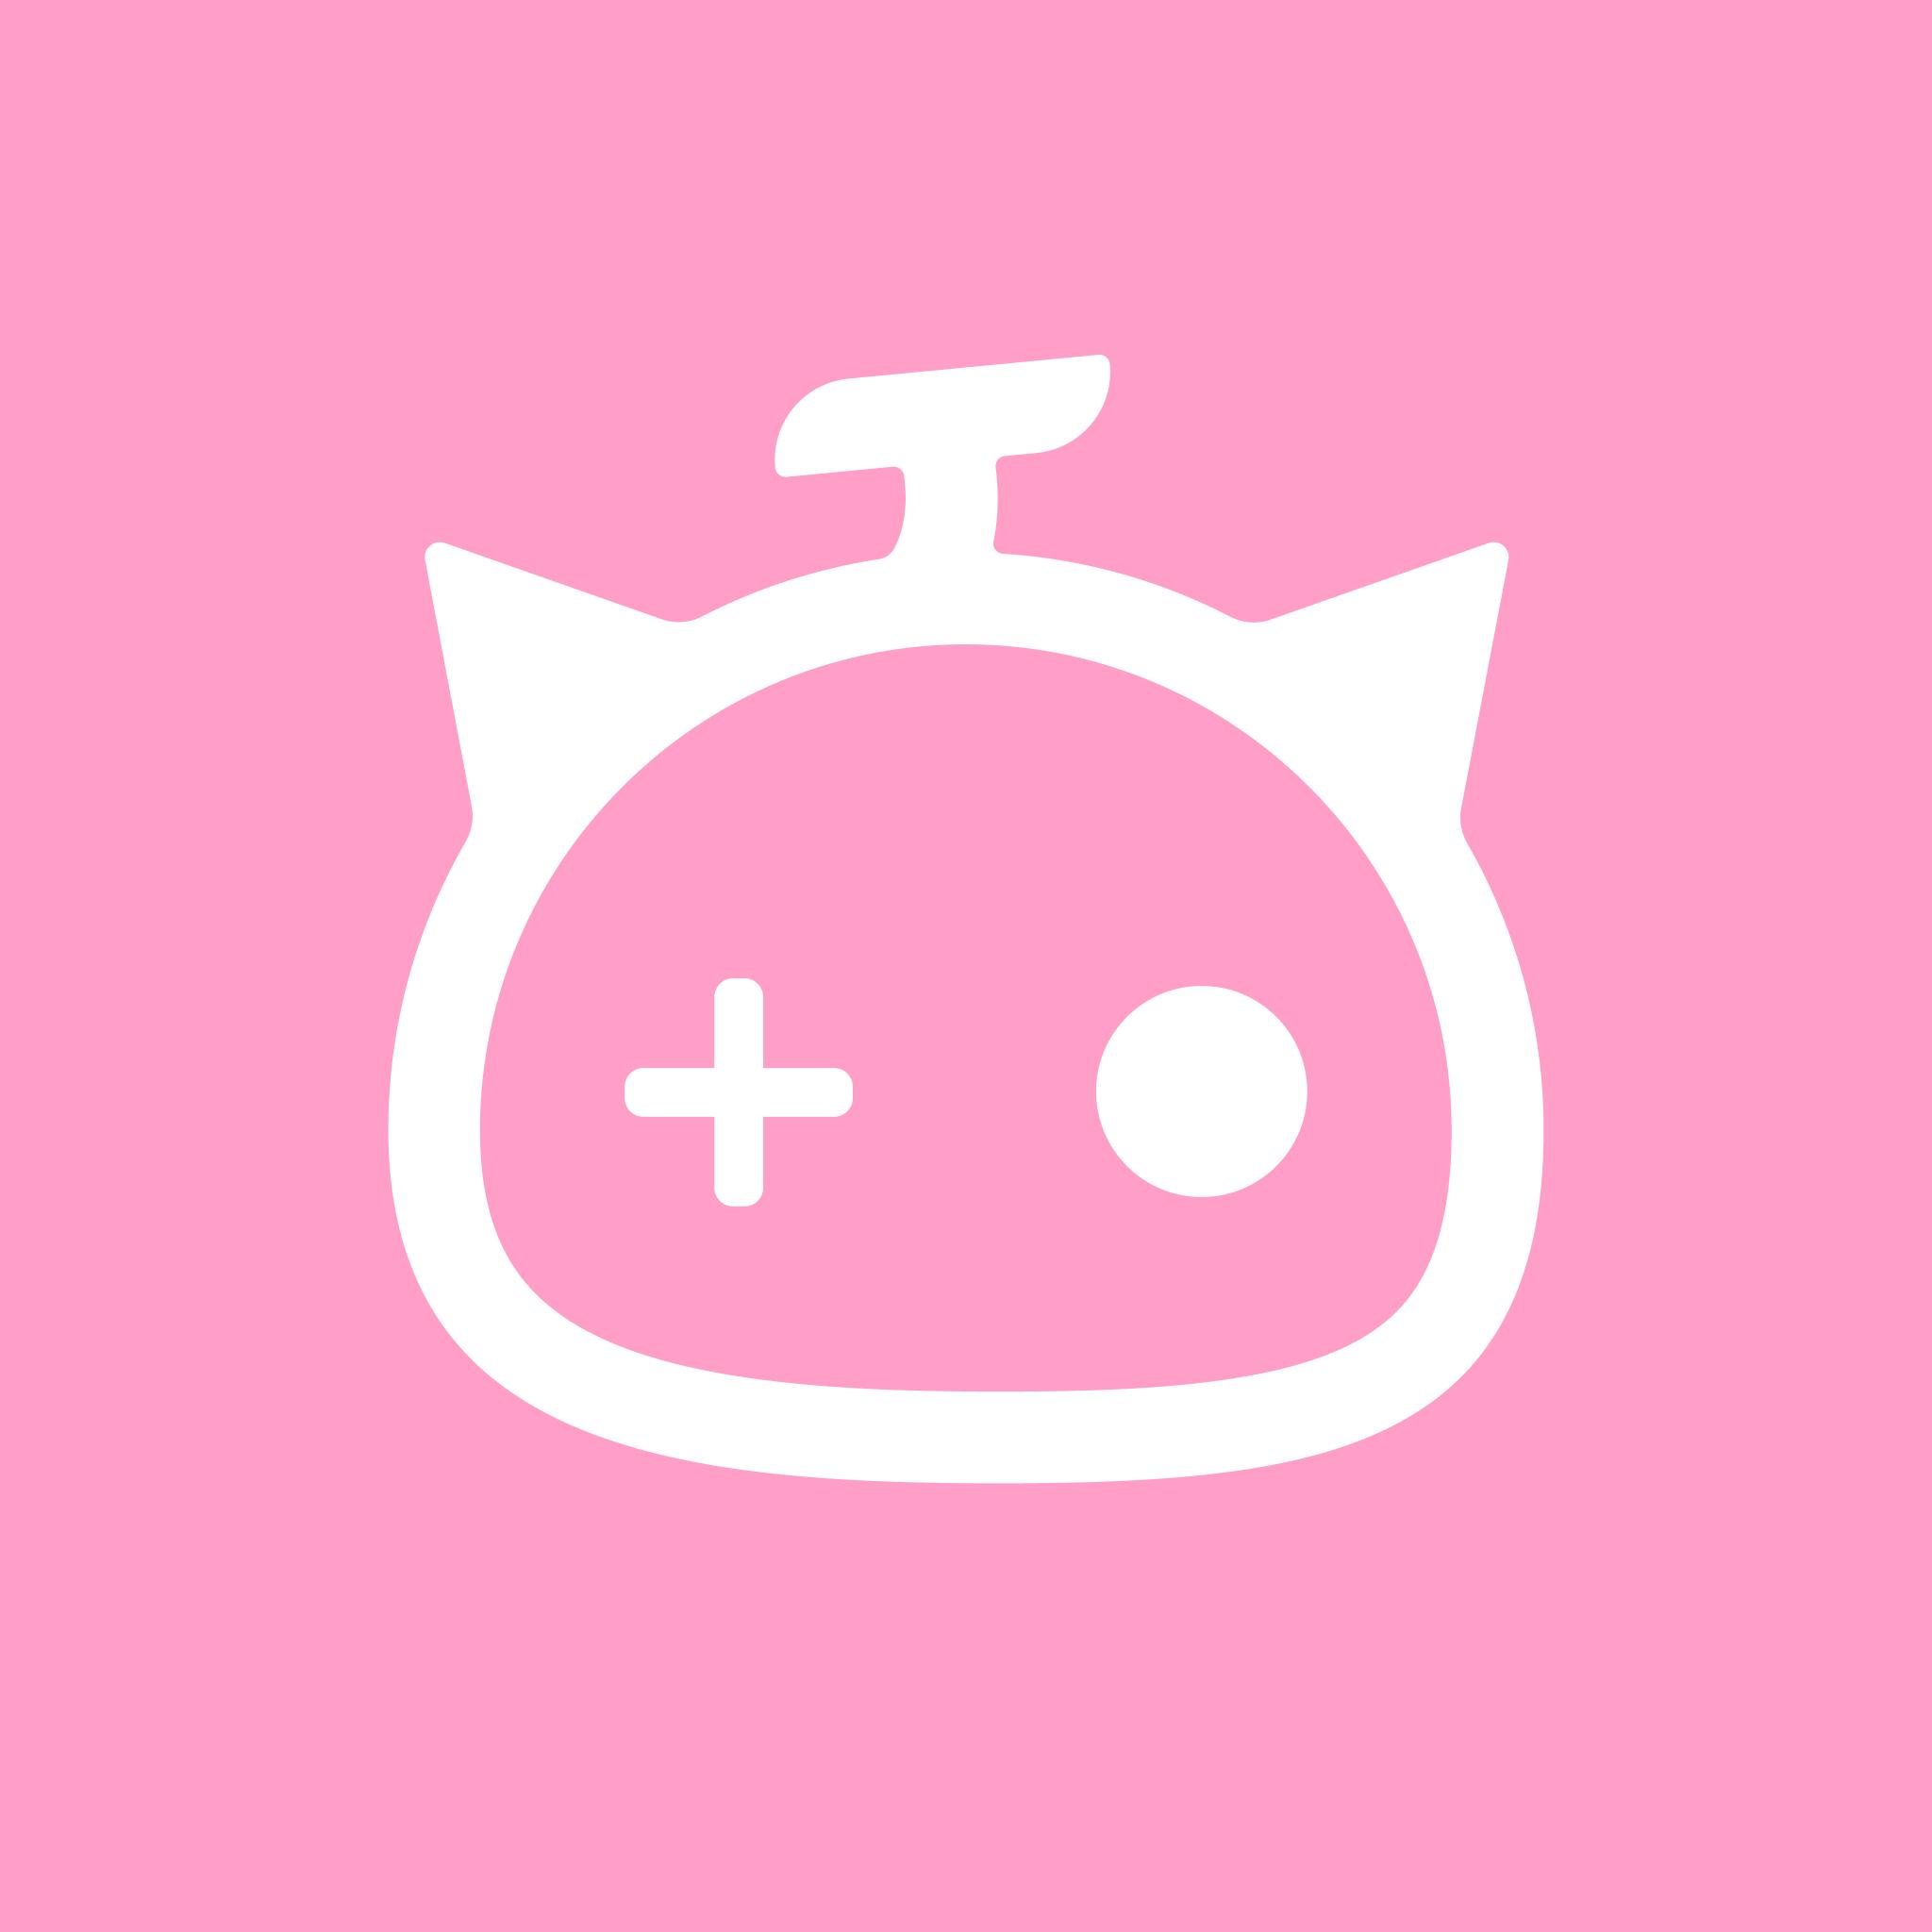 Tomon二次元交友社区v1.0 最新版